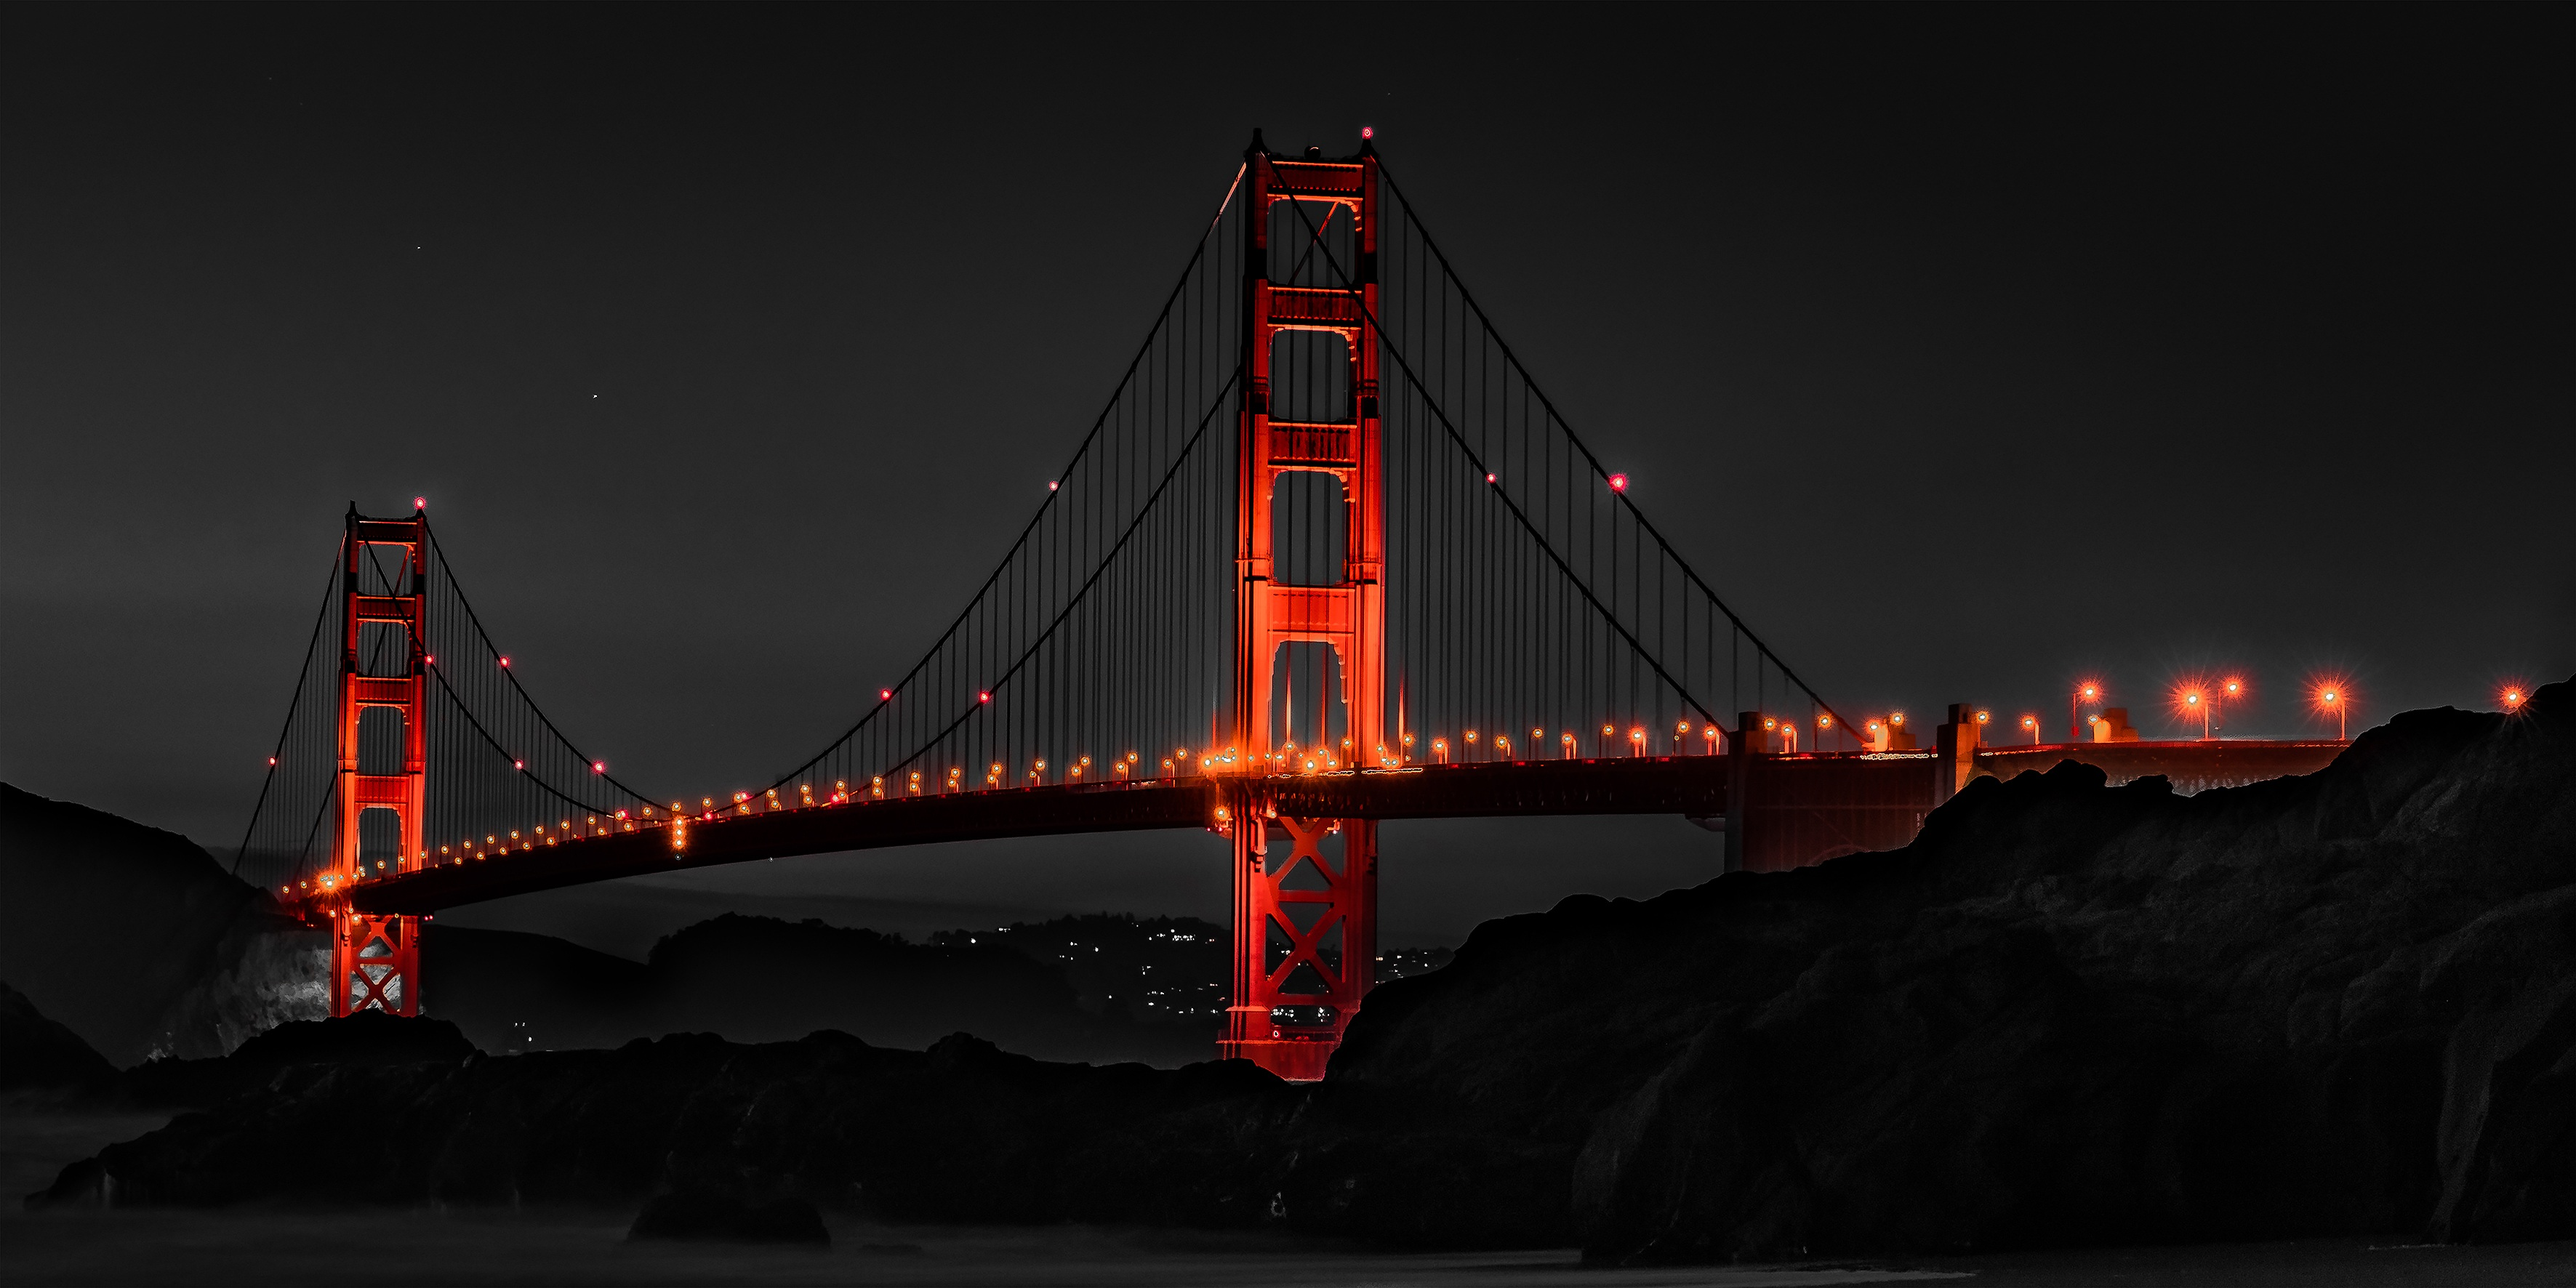 Great Wallpaper Night Golden Gate Bridge - golden-gate-bridge-san-francisco-night-ds  Gallery-12783.jpg